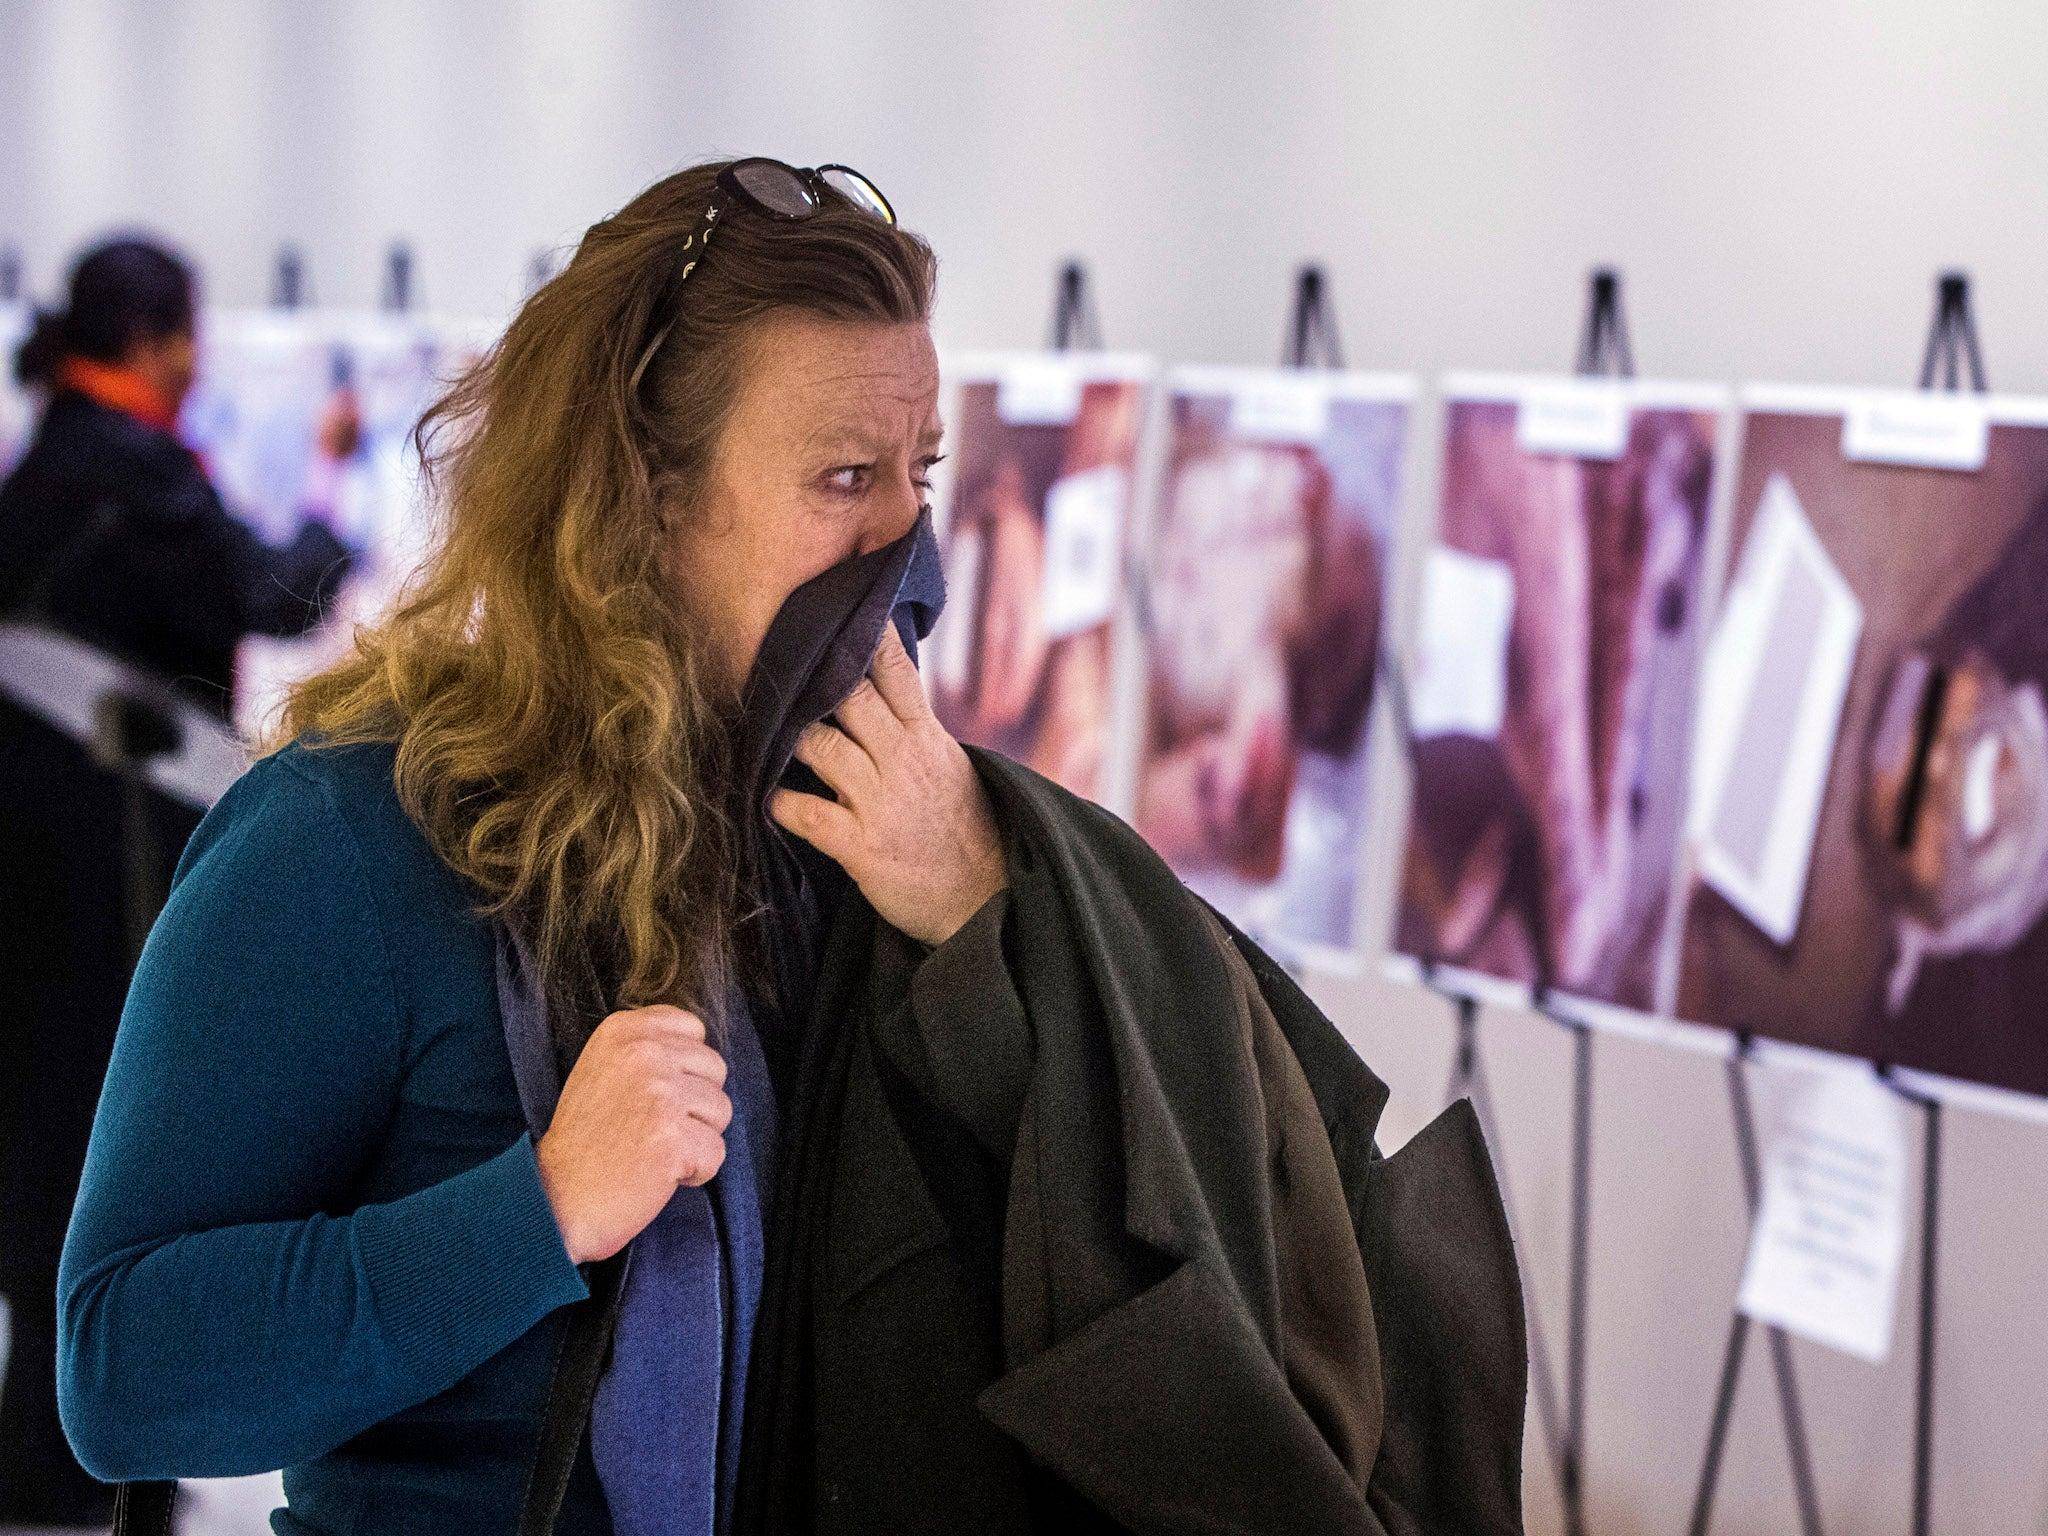 'Disturbing' Syria torture images go on display at UN headquarters